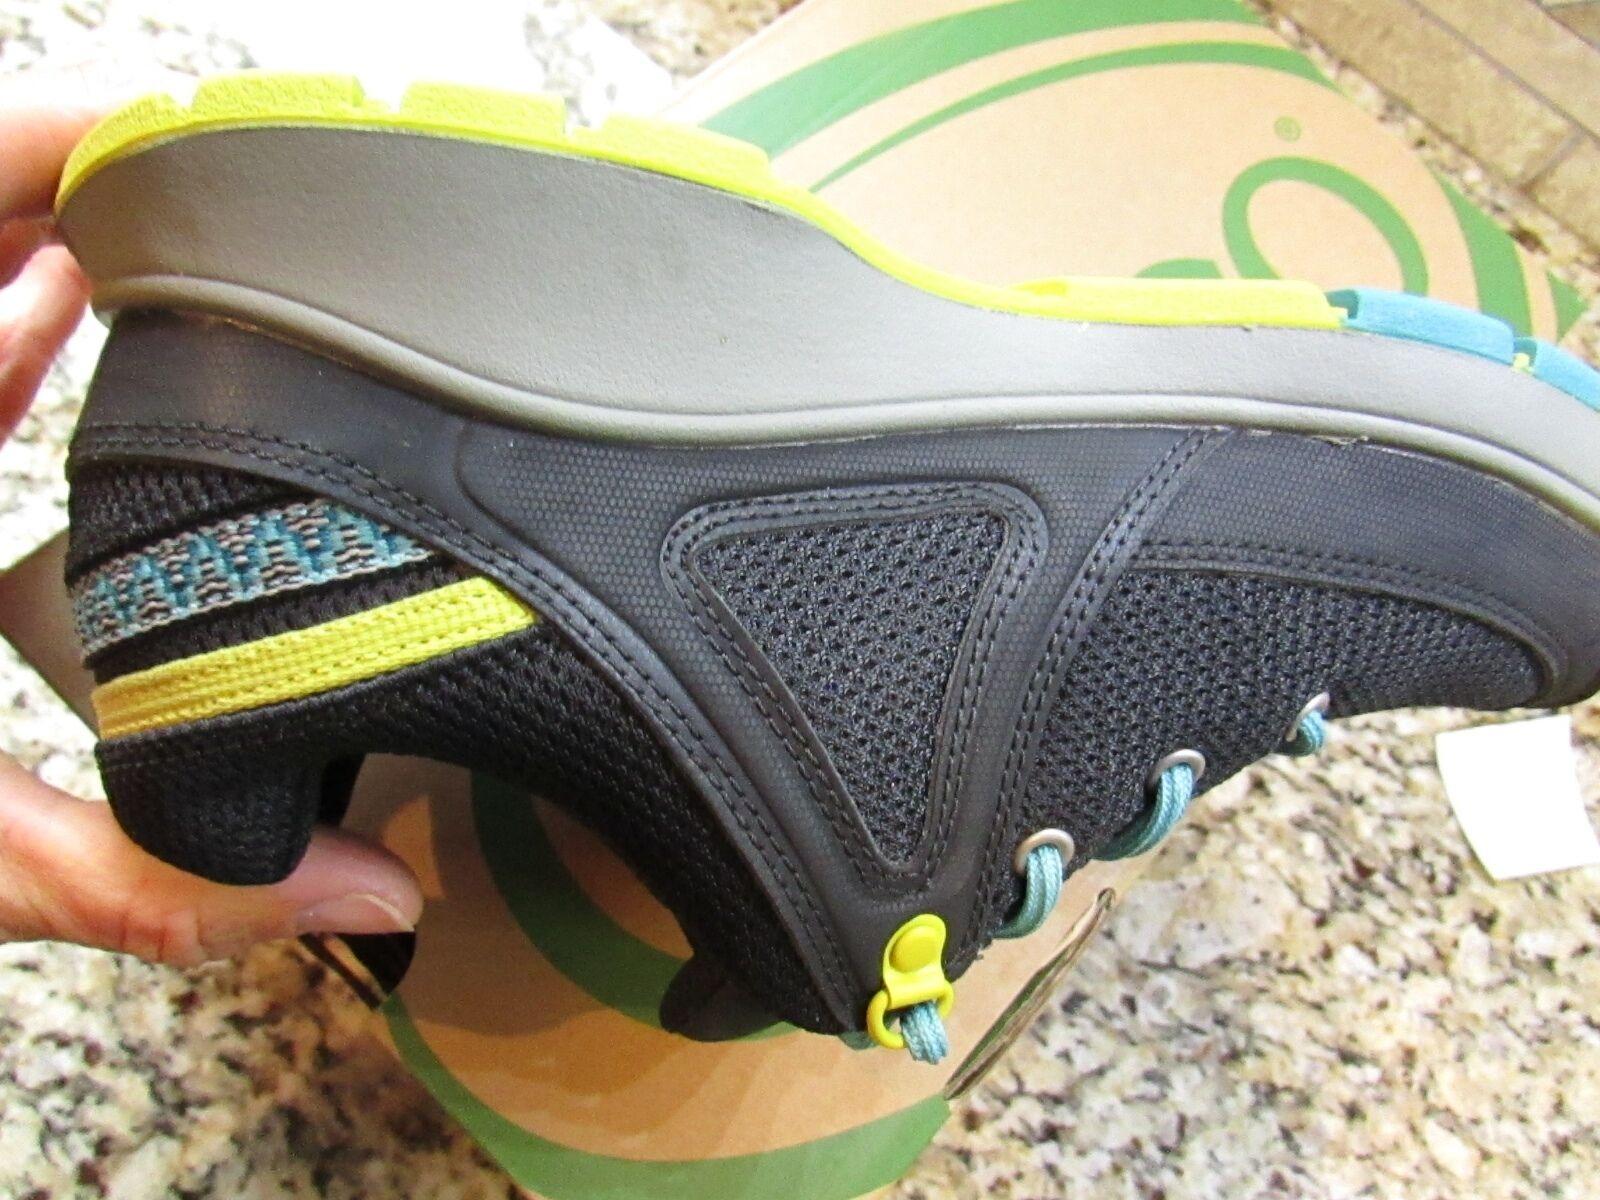 NEW CHACO VIKA nero ATHLETIC ATHLETIC ATHLETIC scarpe donna 6 nero ECO-TREAD  FREE SHIP 5cff3c